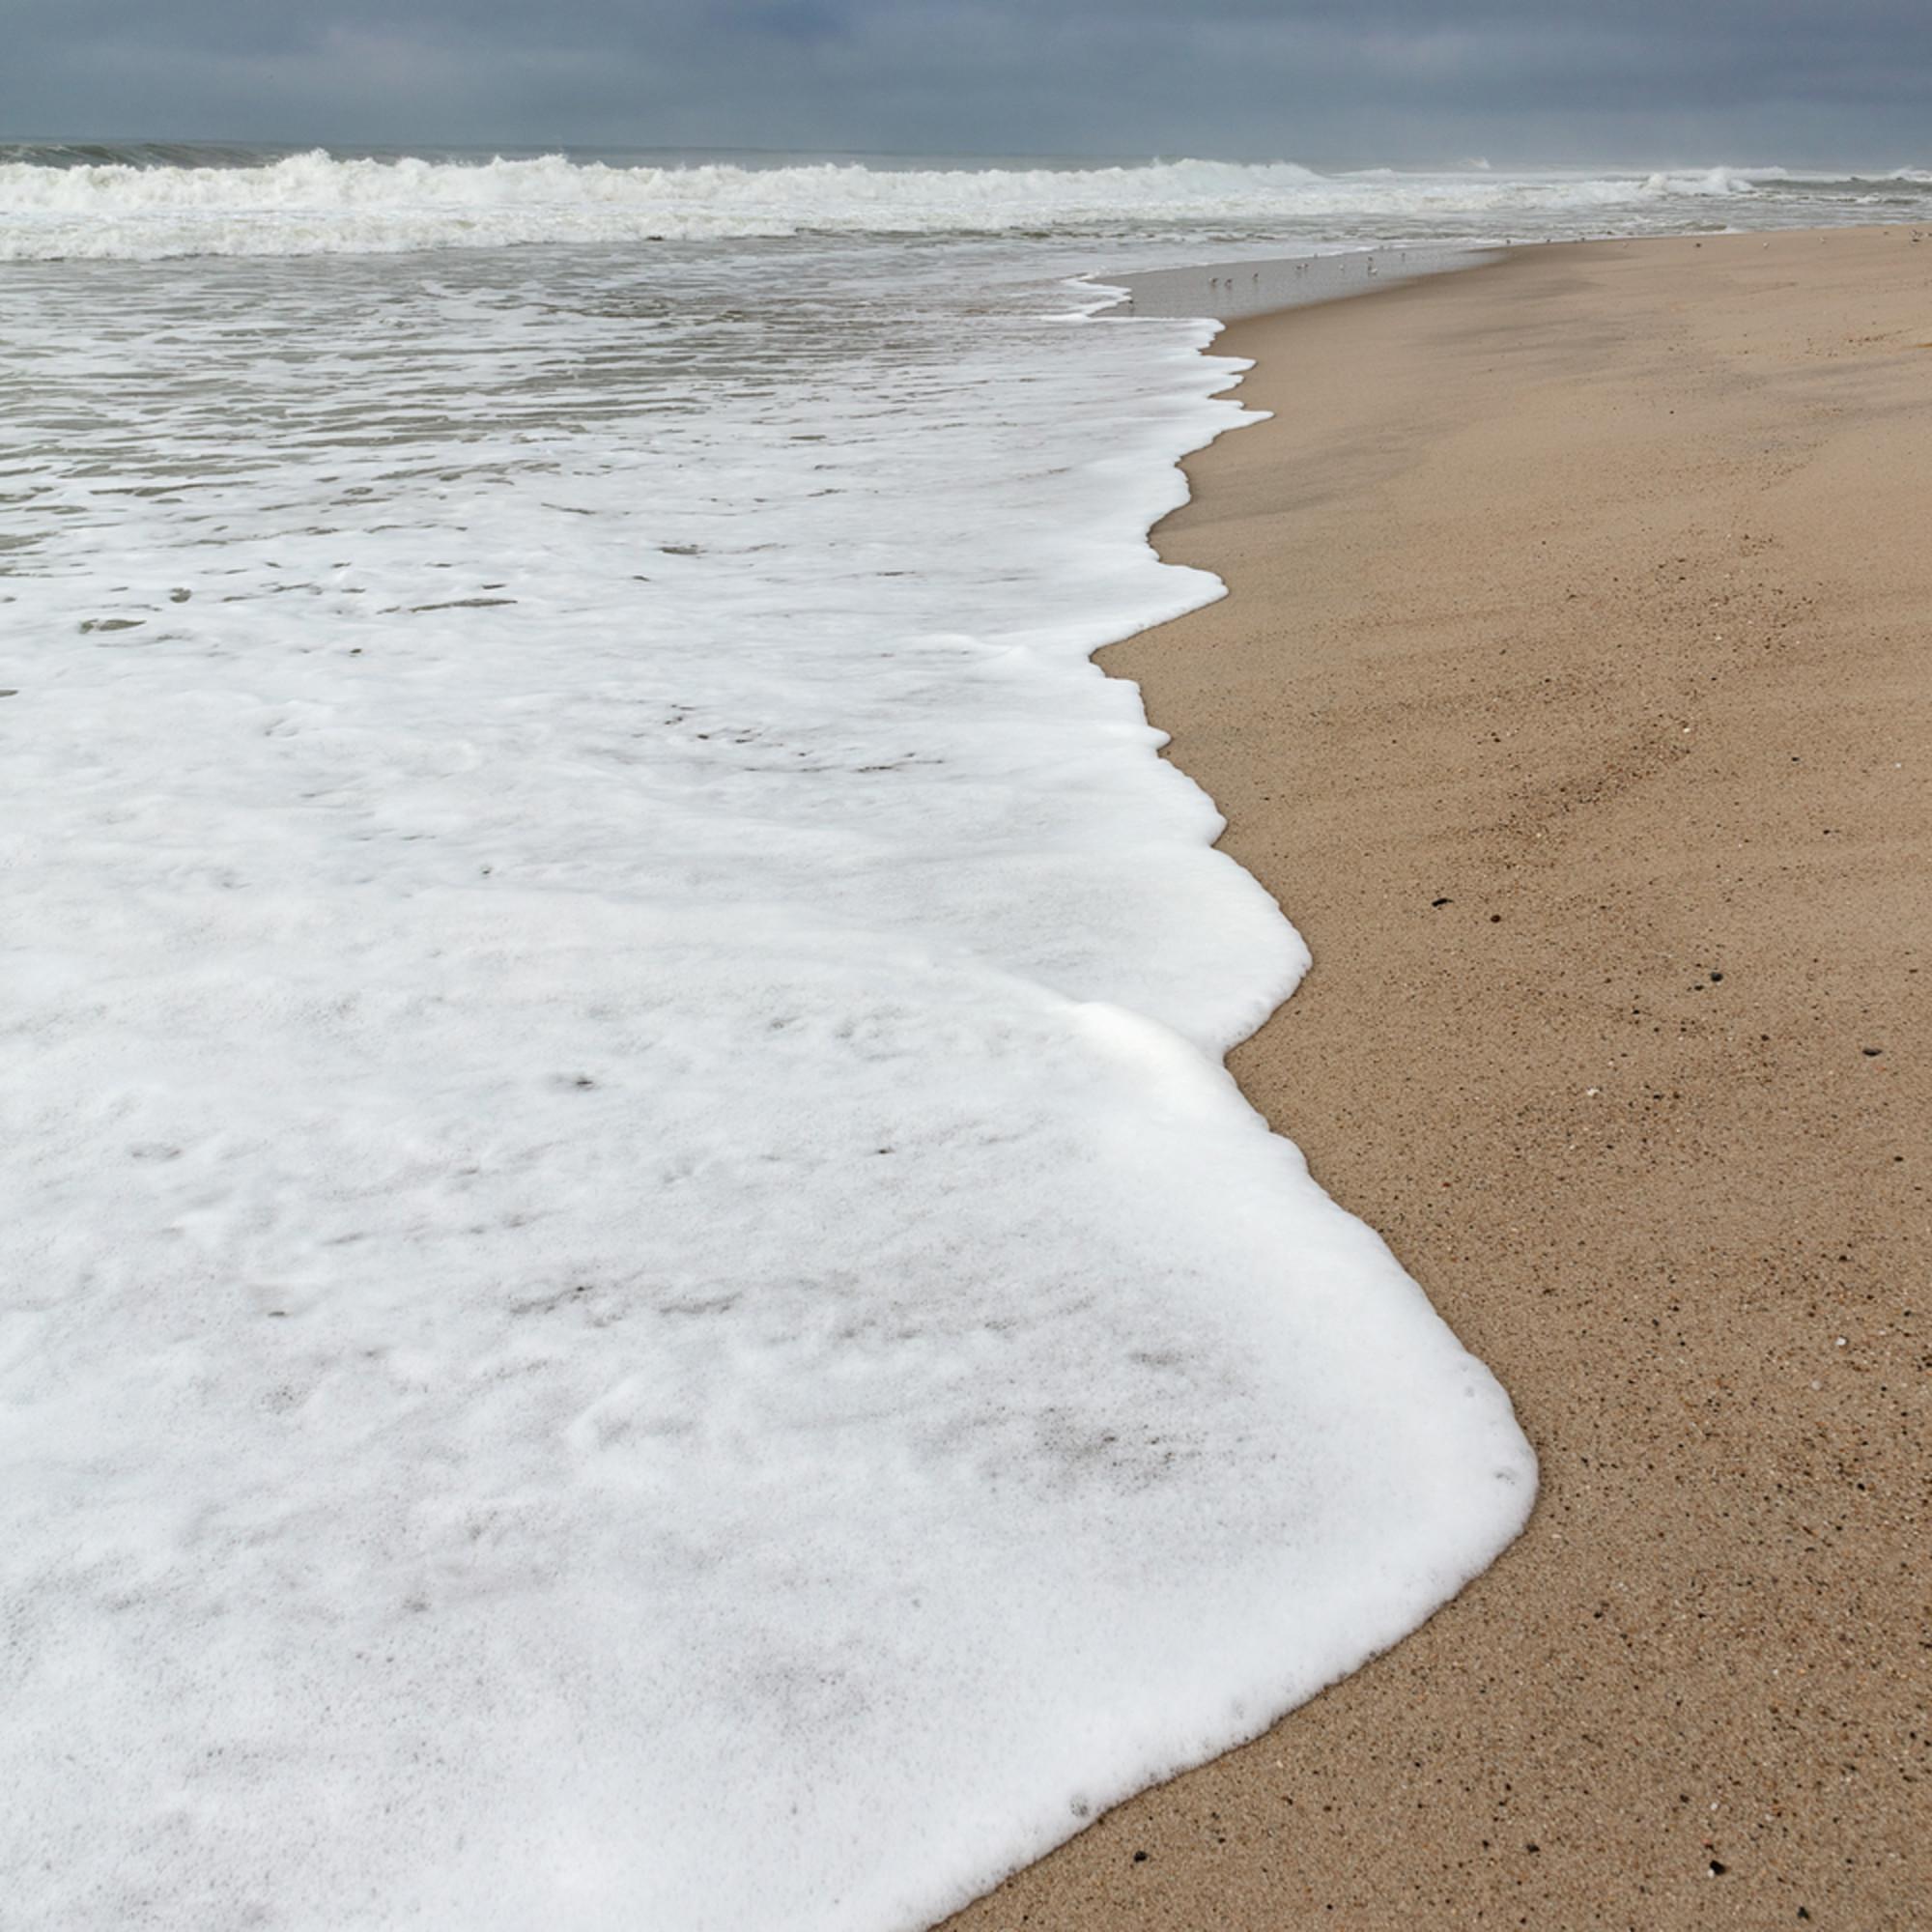 Cisco beach nantucket waves 20170917 6745 web rqdkk6